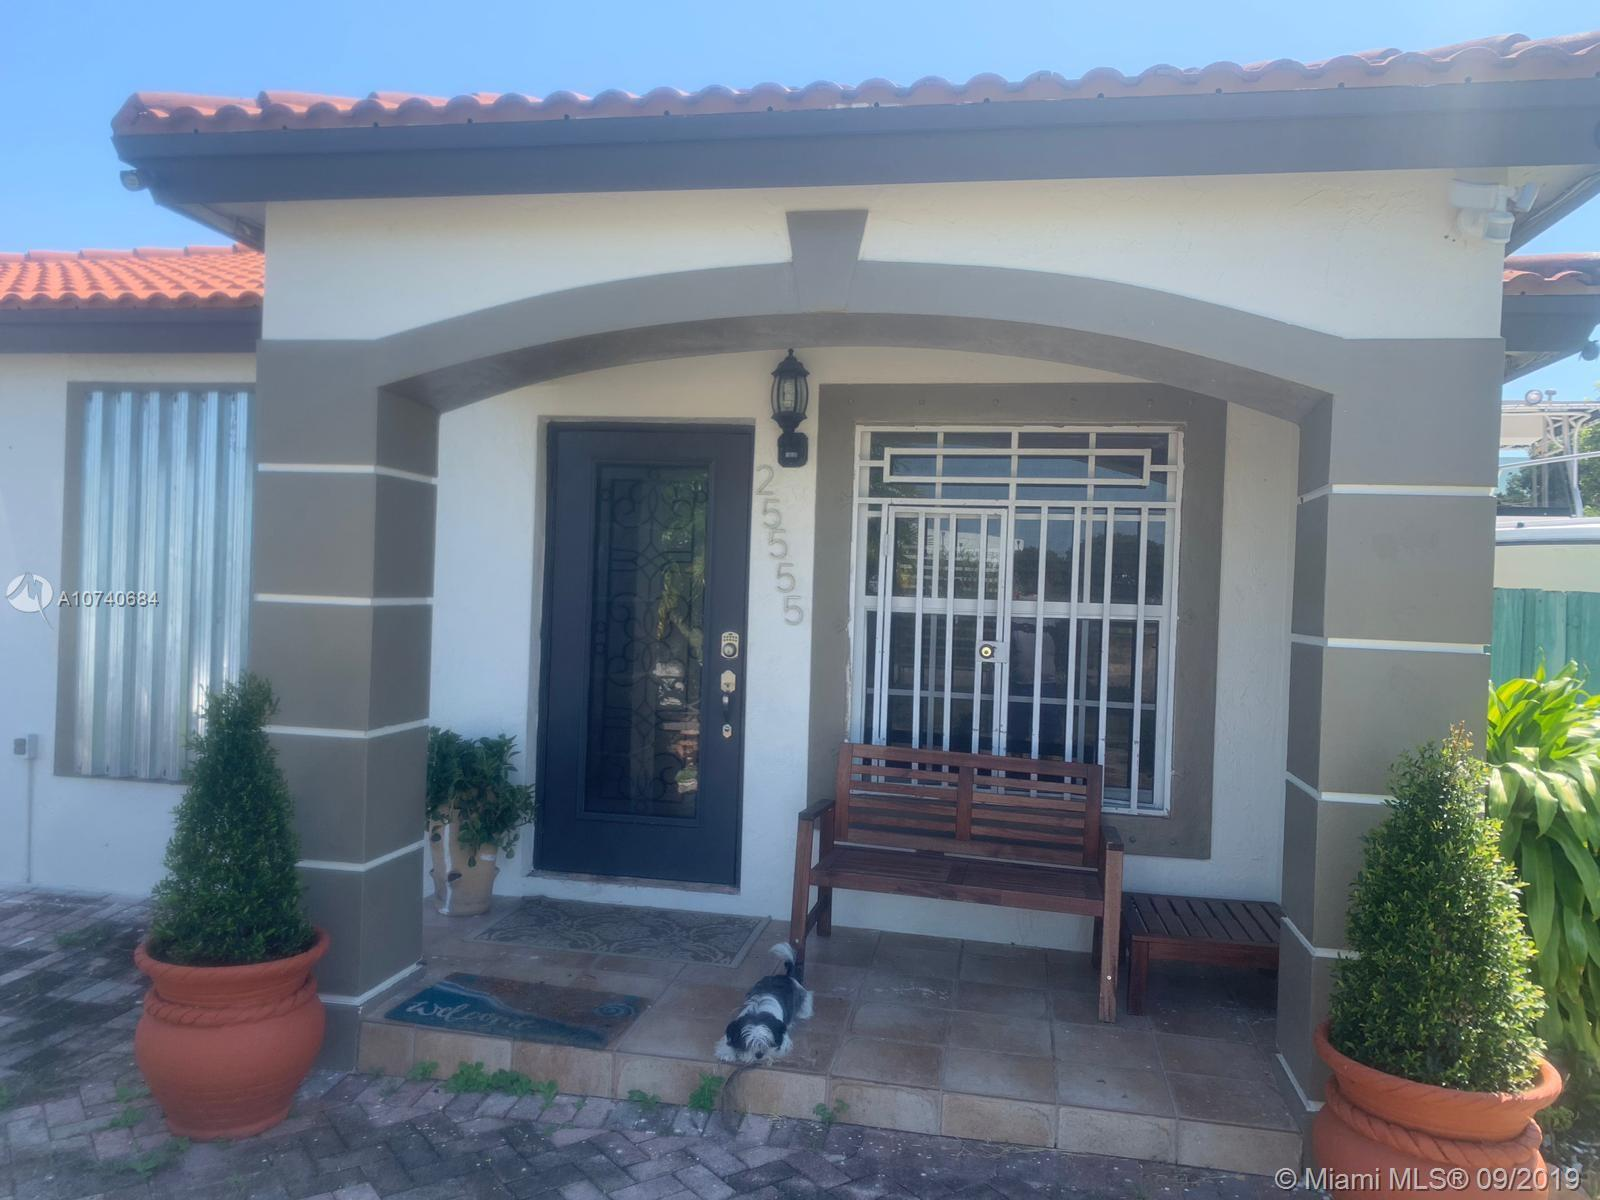 25555 139 Ave, Homestead, FL 33032 - Homestead, FL real estate listing